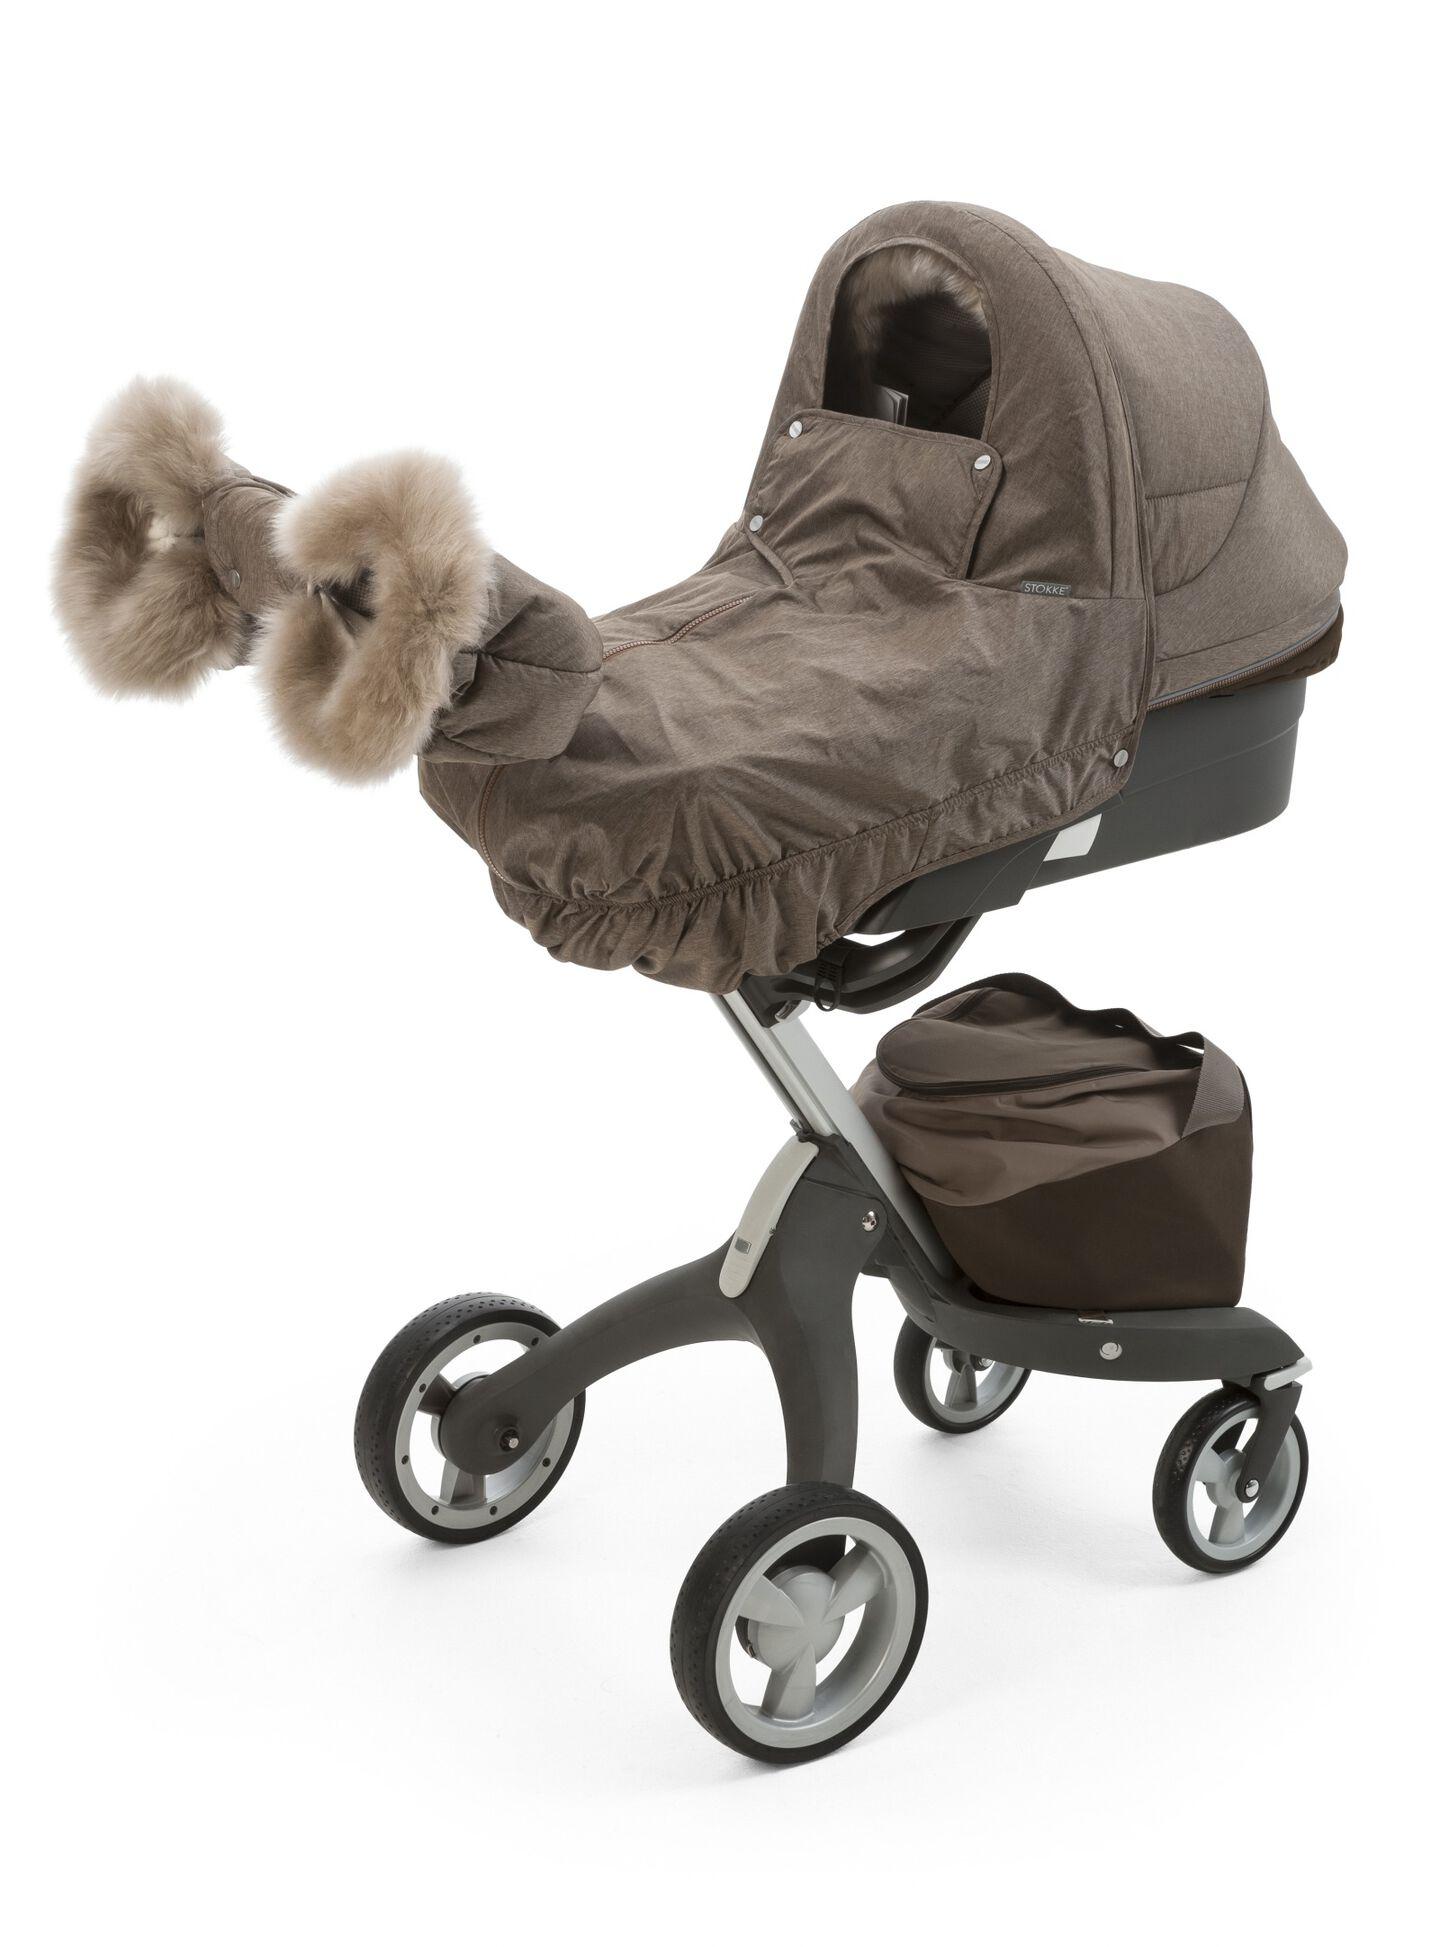 Stokke® Xplory® Carry Cot with Winter Kit, Nougat Melange.